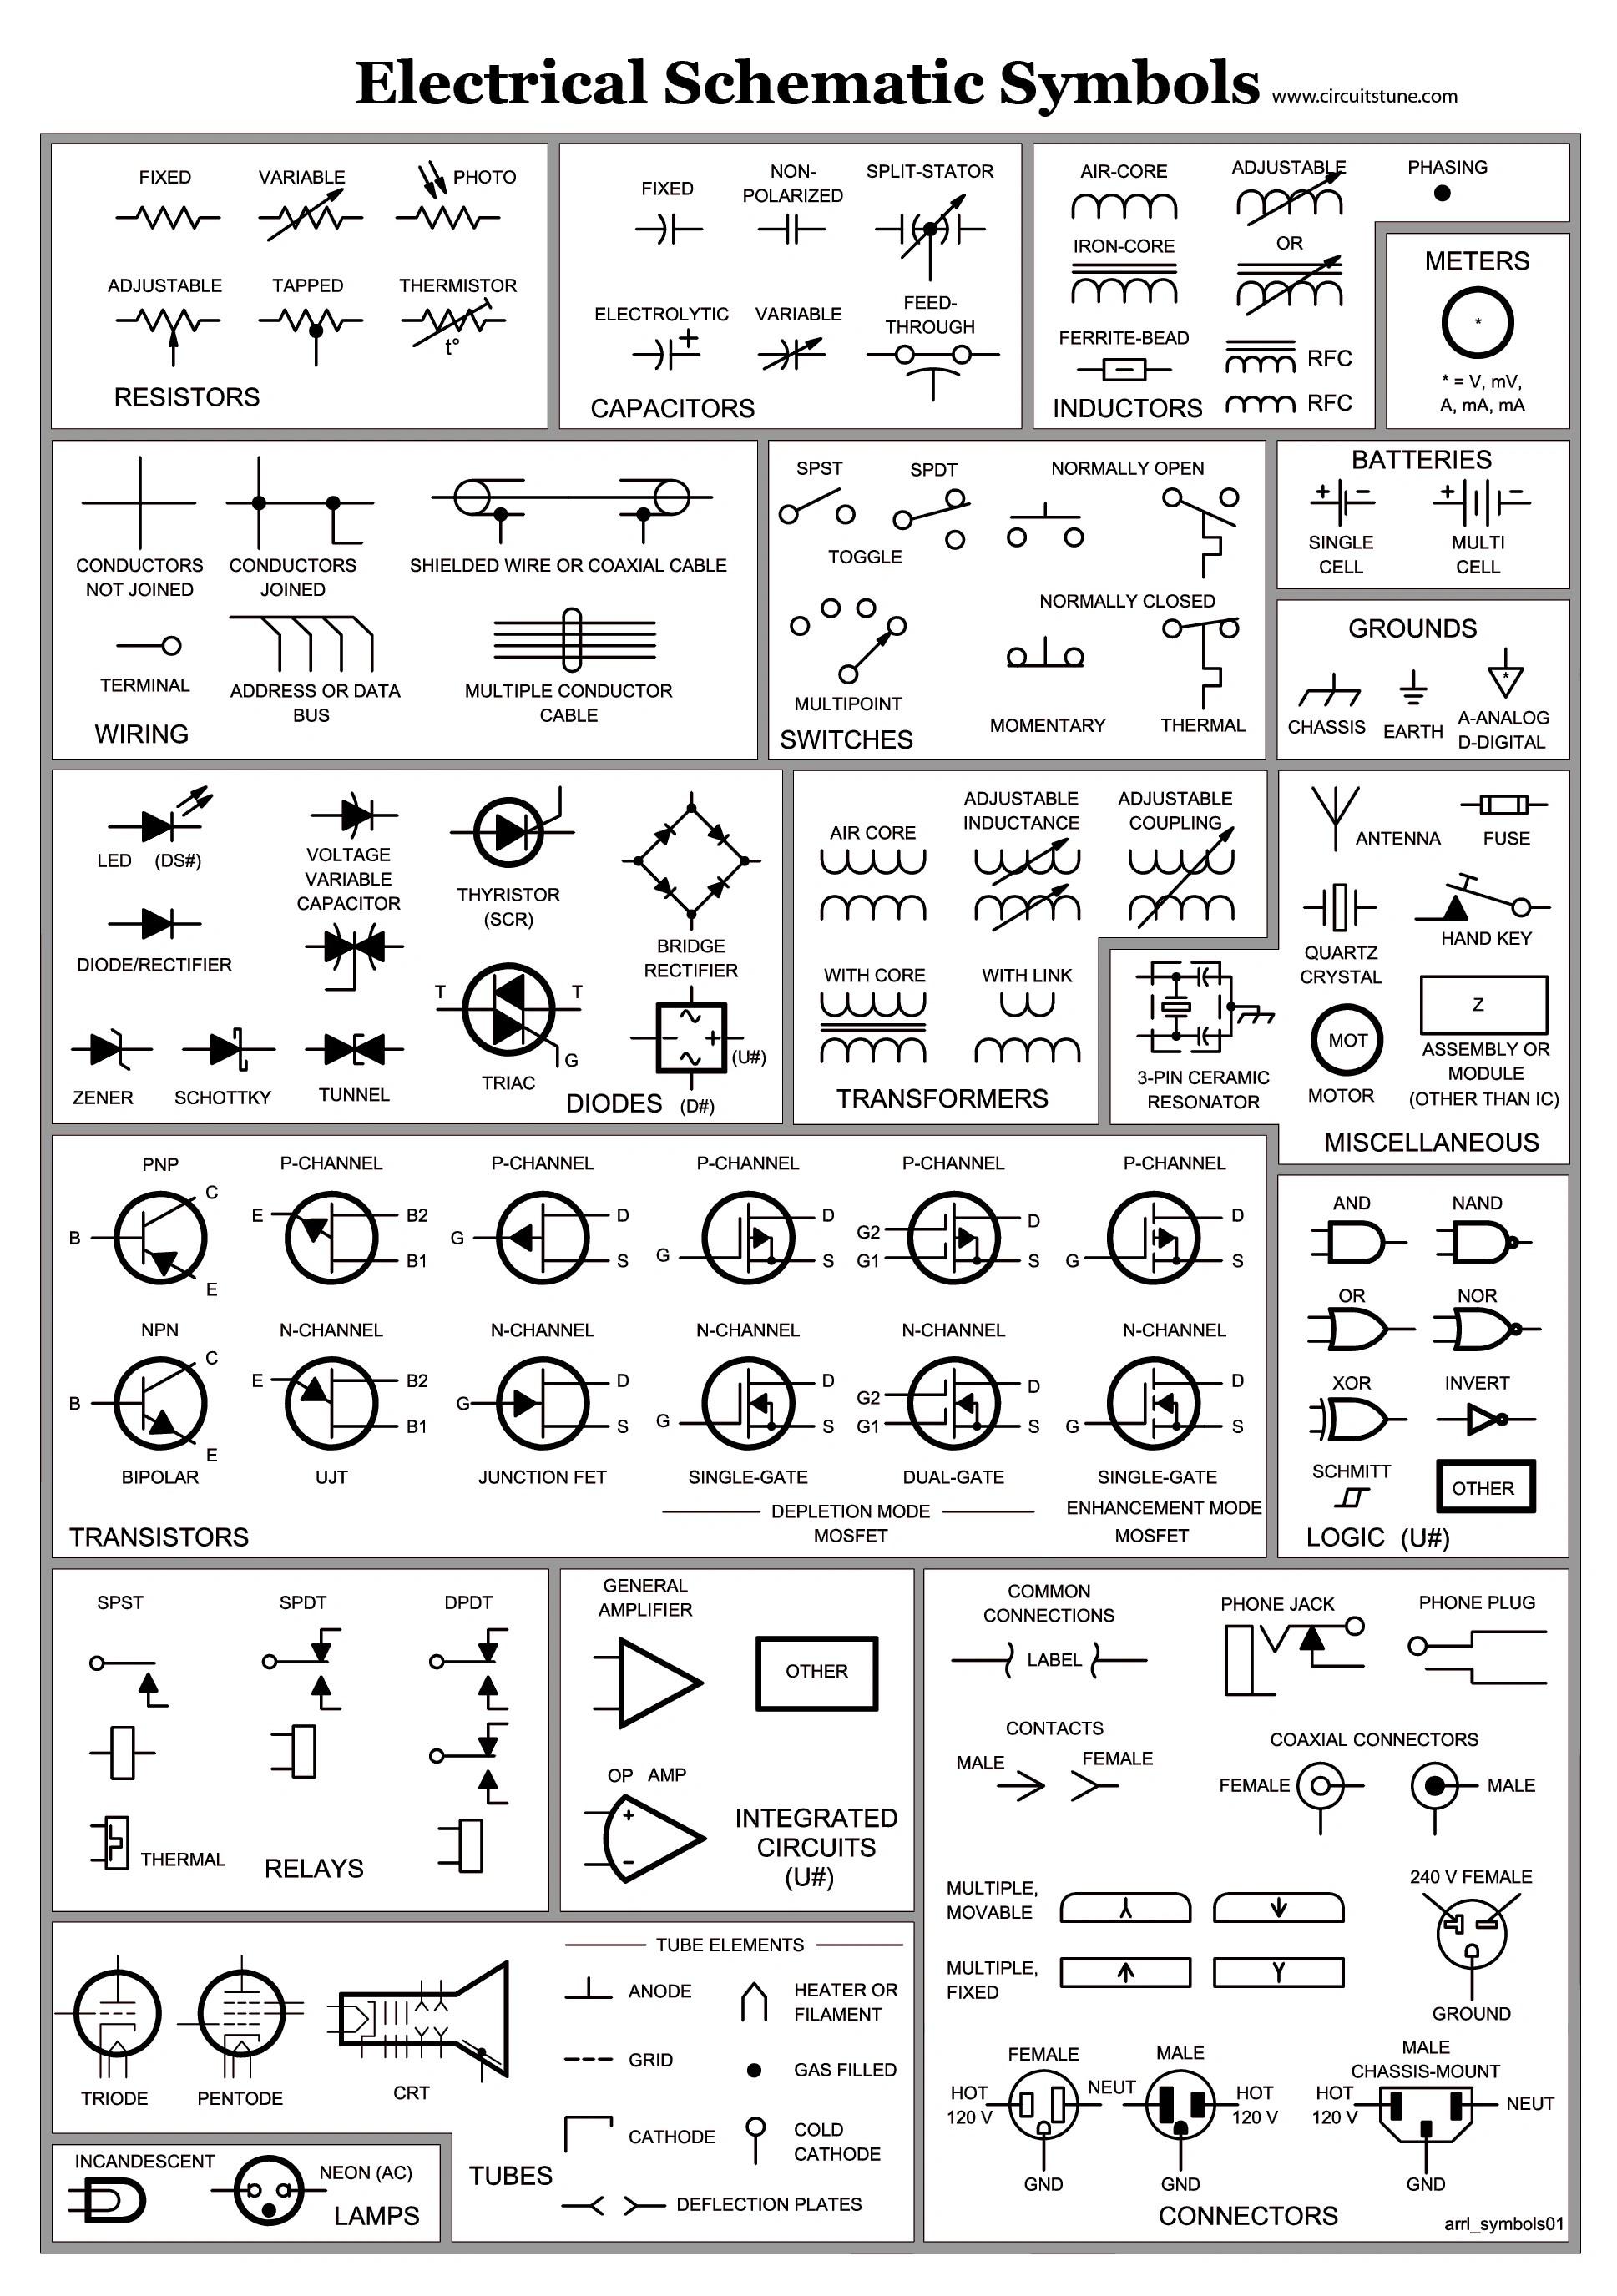 medium resolution of basic electrical wiring symbols pdf wiring diagram expert iec electrical schematic symbols pdf basic electrical wiring